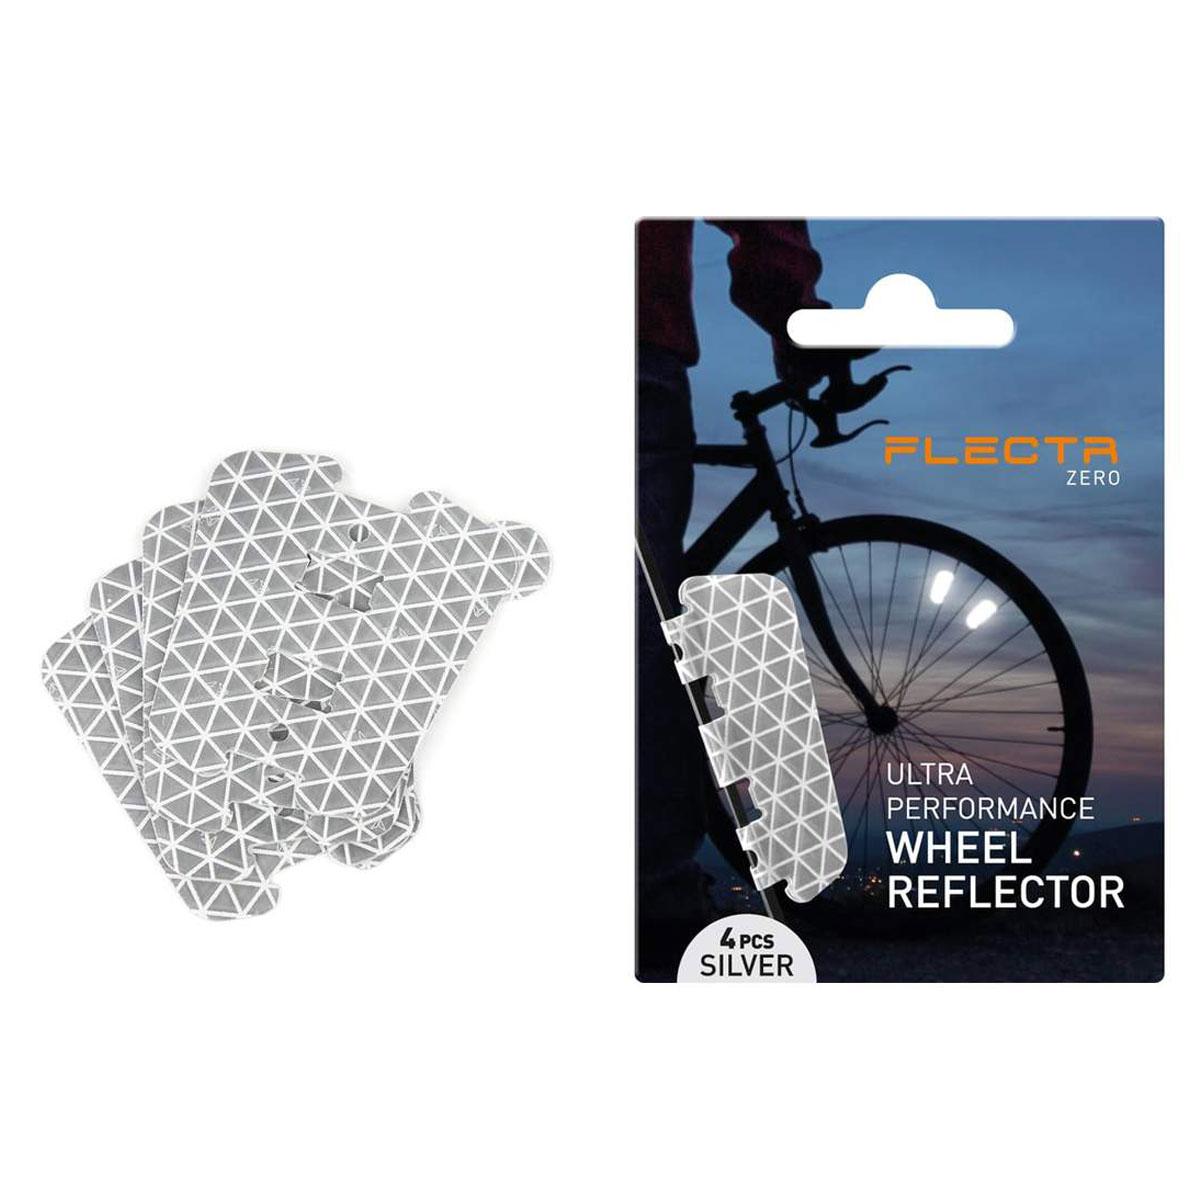 ENSEMBLE DE REFLECTEURS DE RAYON FLECTR UNITE